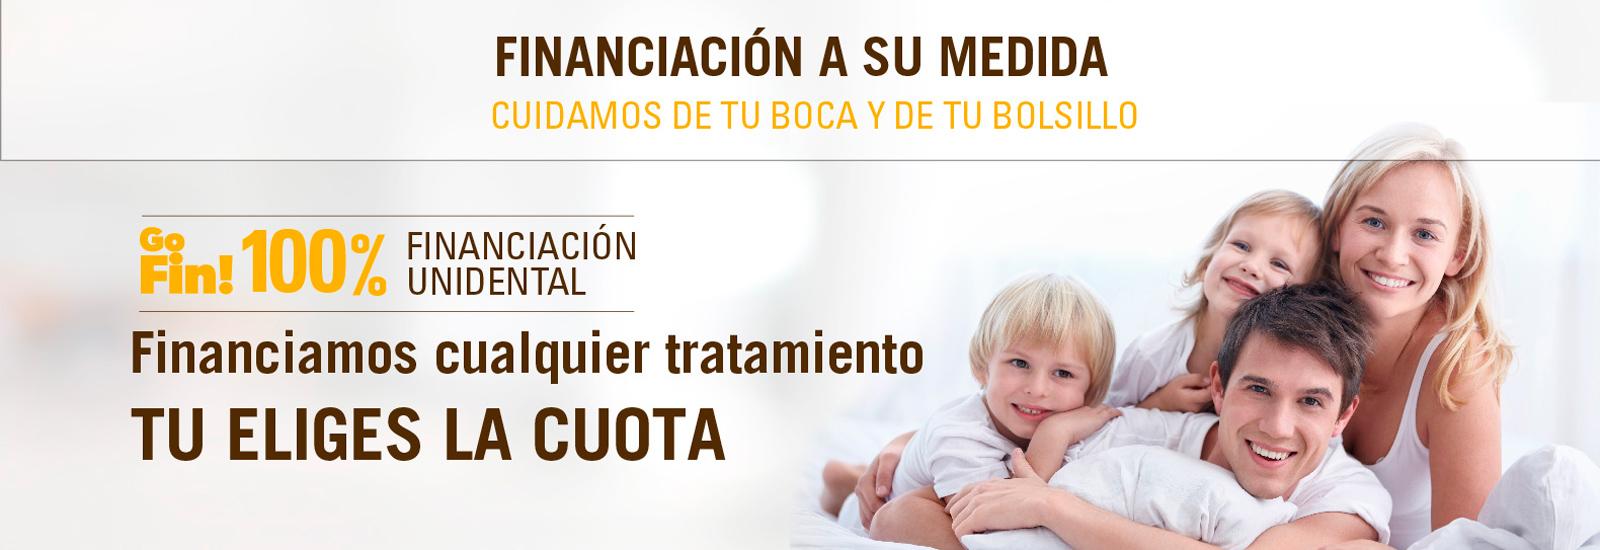 slider-financiacion-2